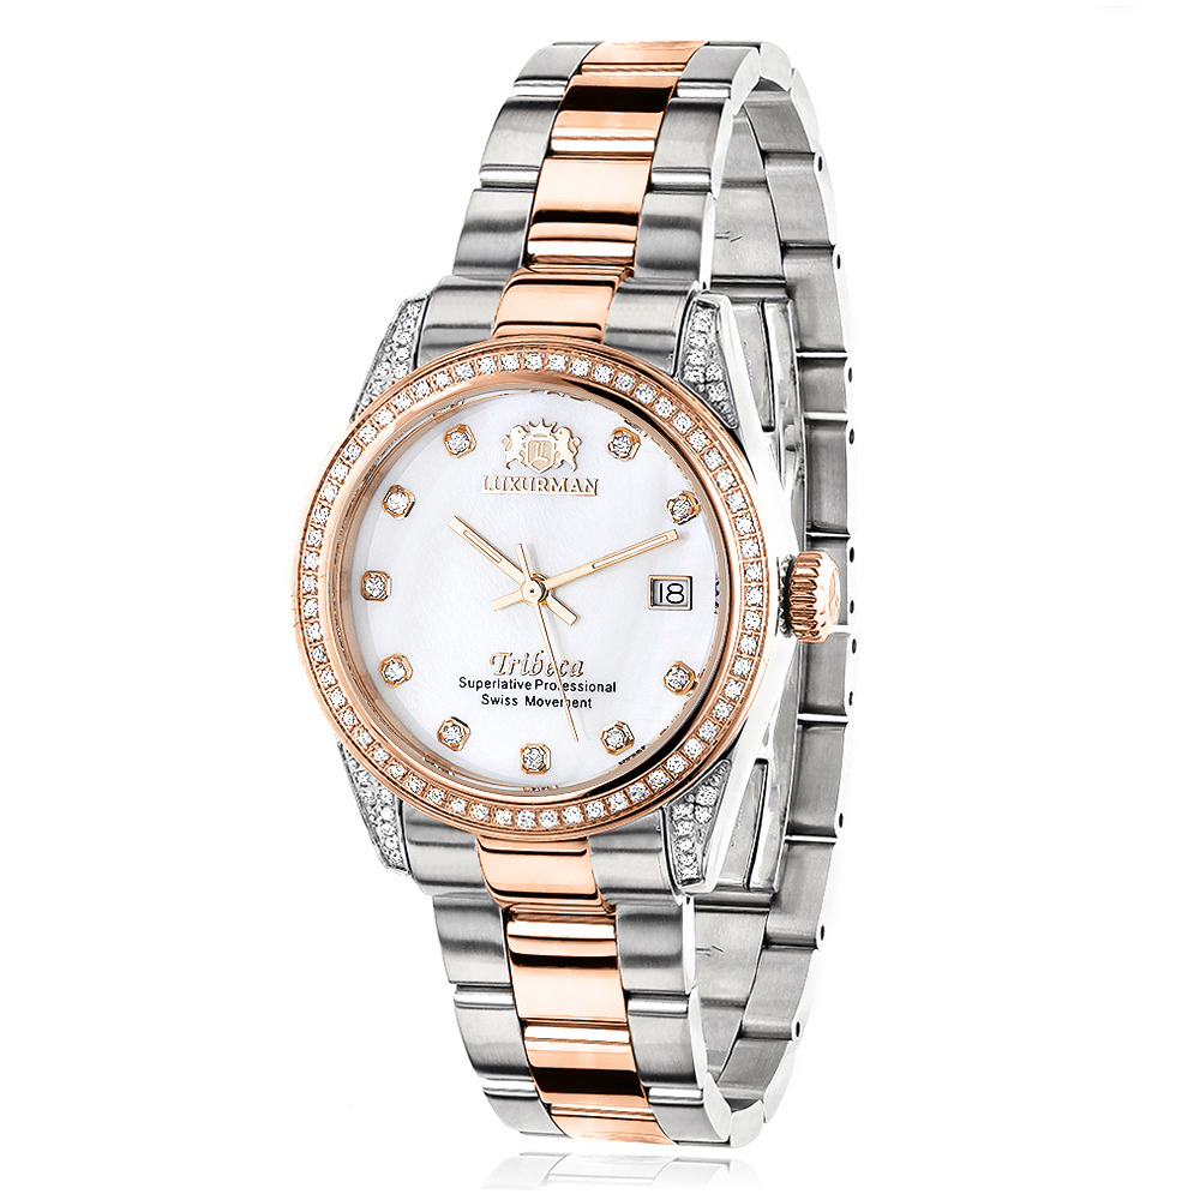 Two Tone Rose Gold Plated Women's Diamond Watch 1.5ct Luxurman Tribeca